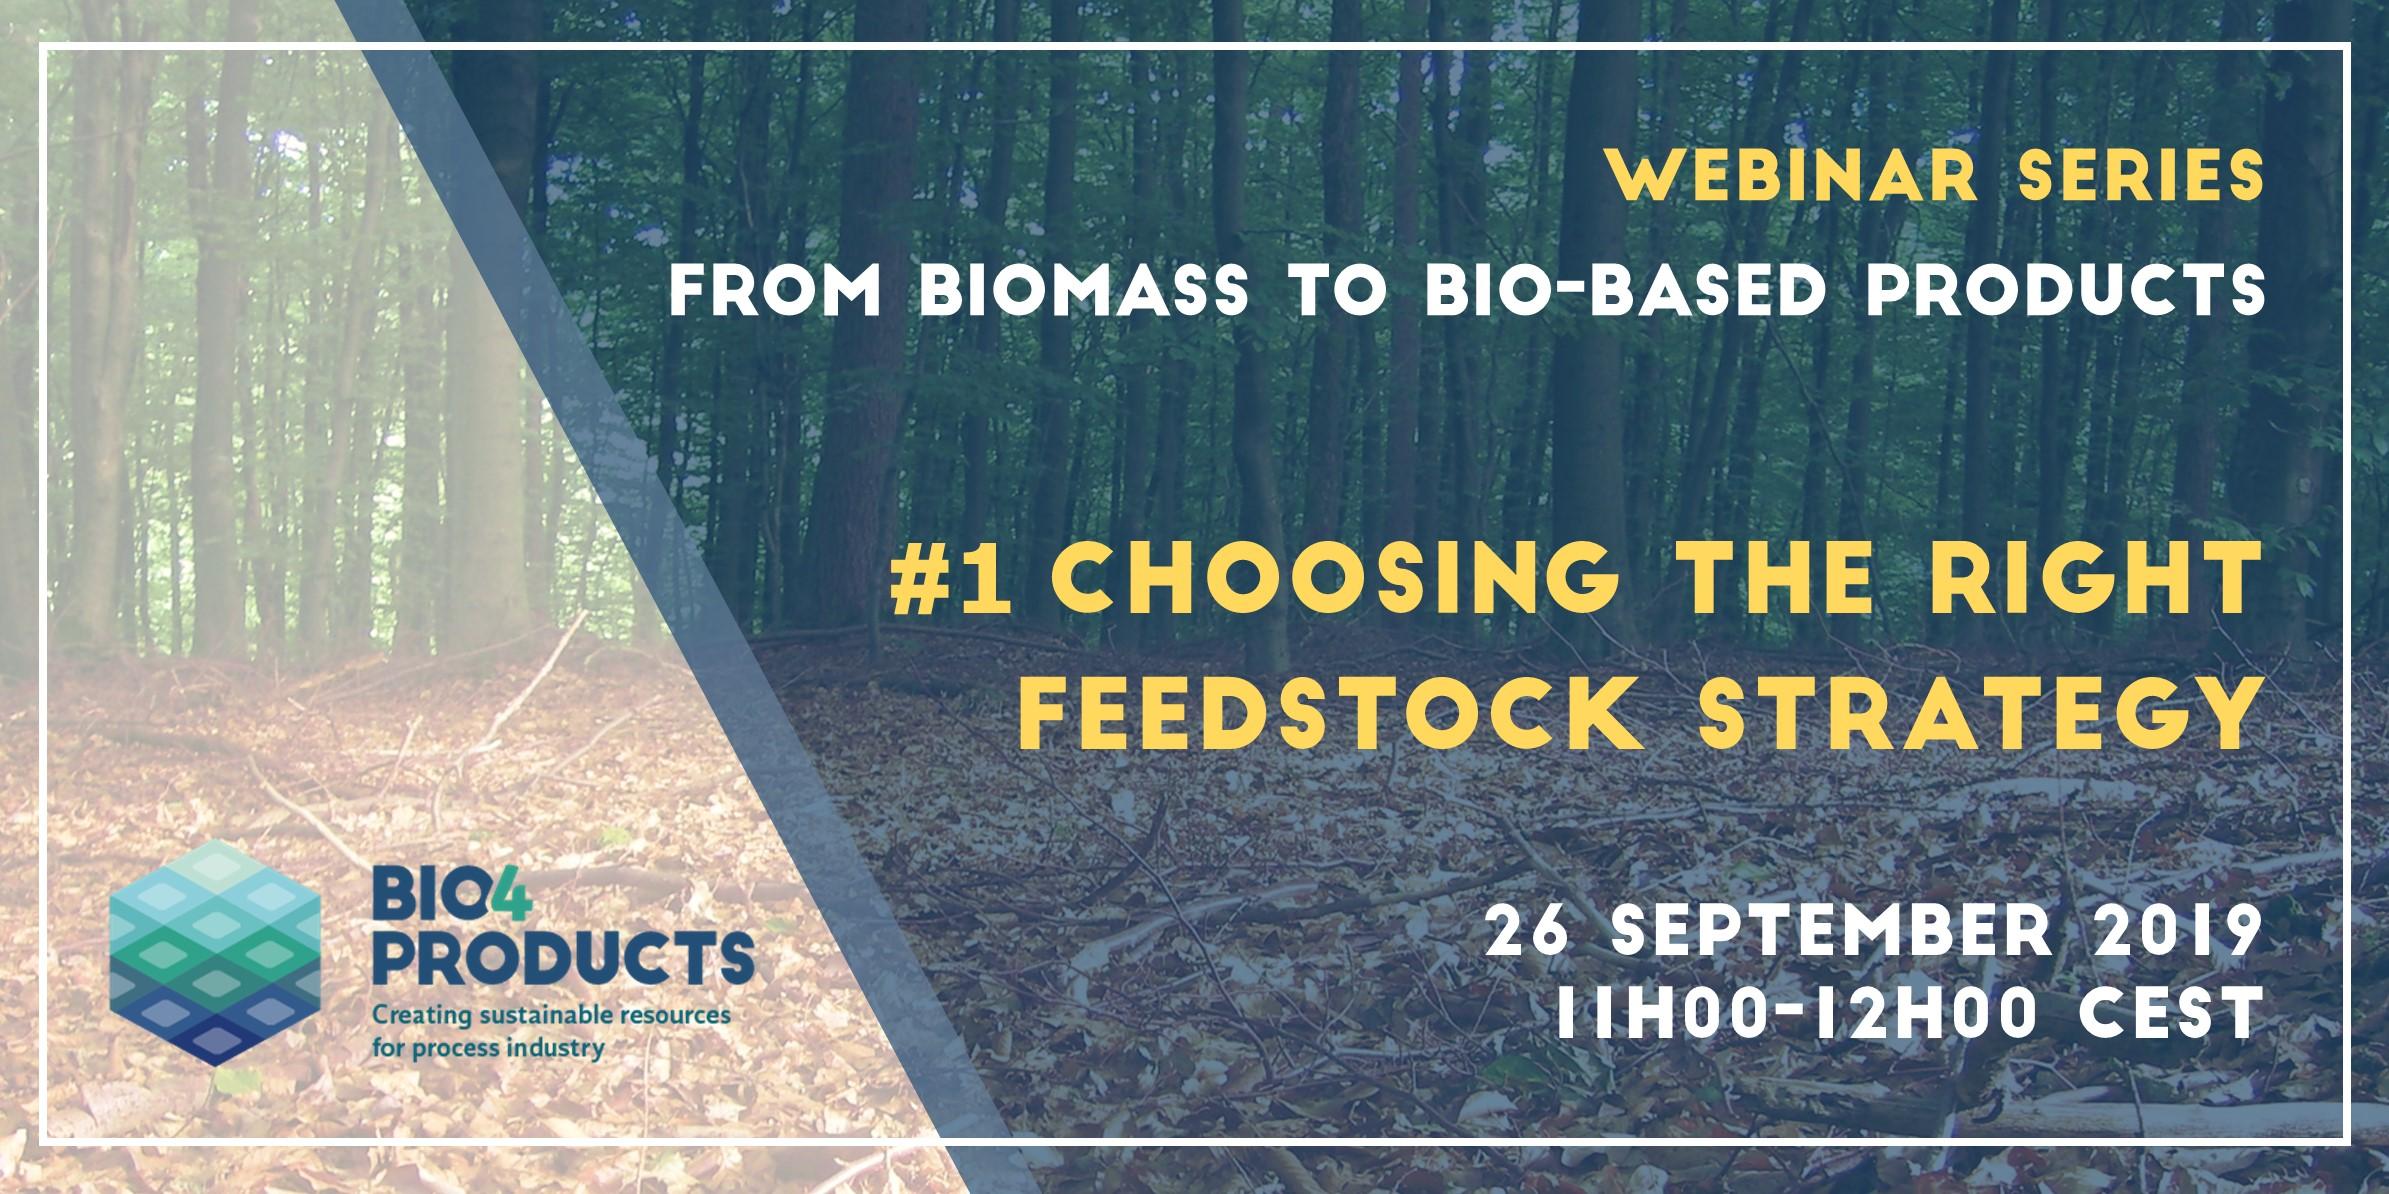 Join our webinar on feedstock strategies!